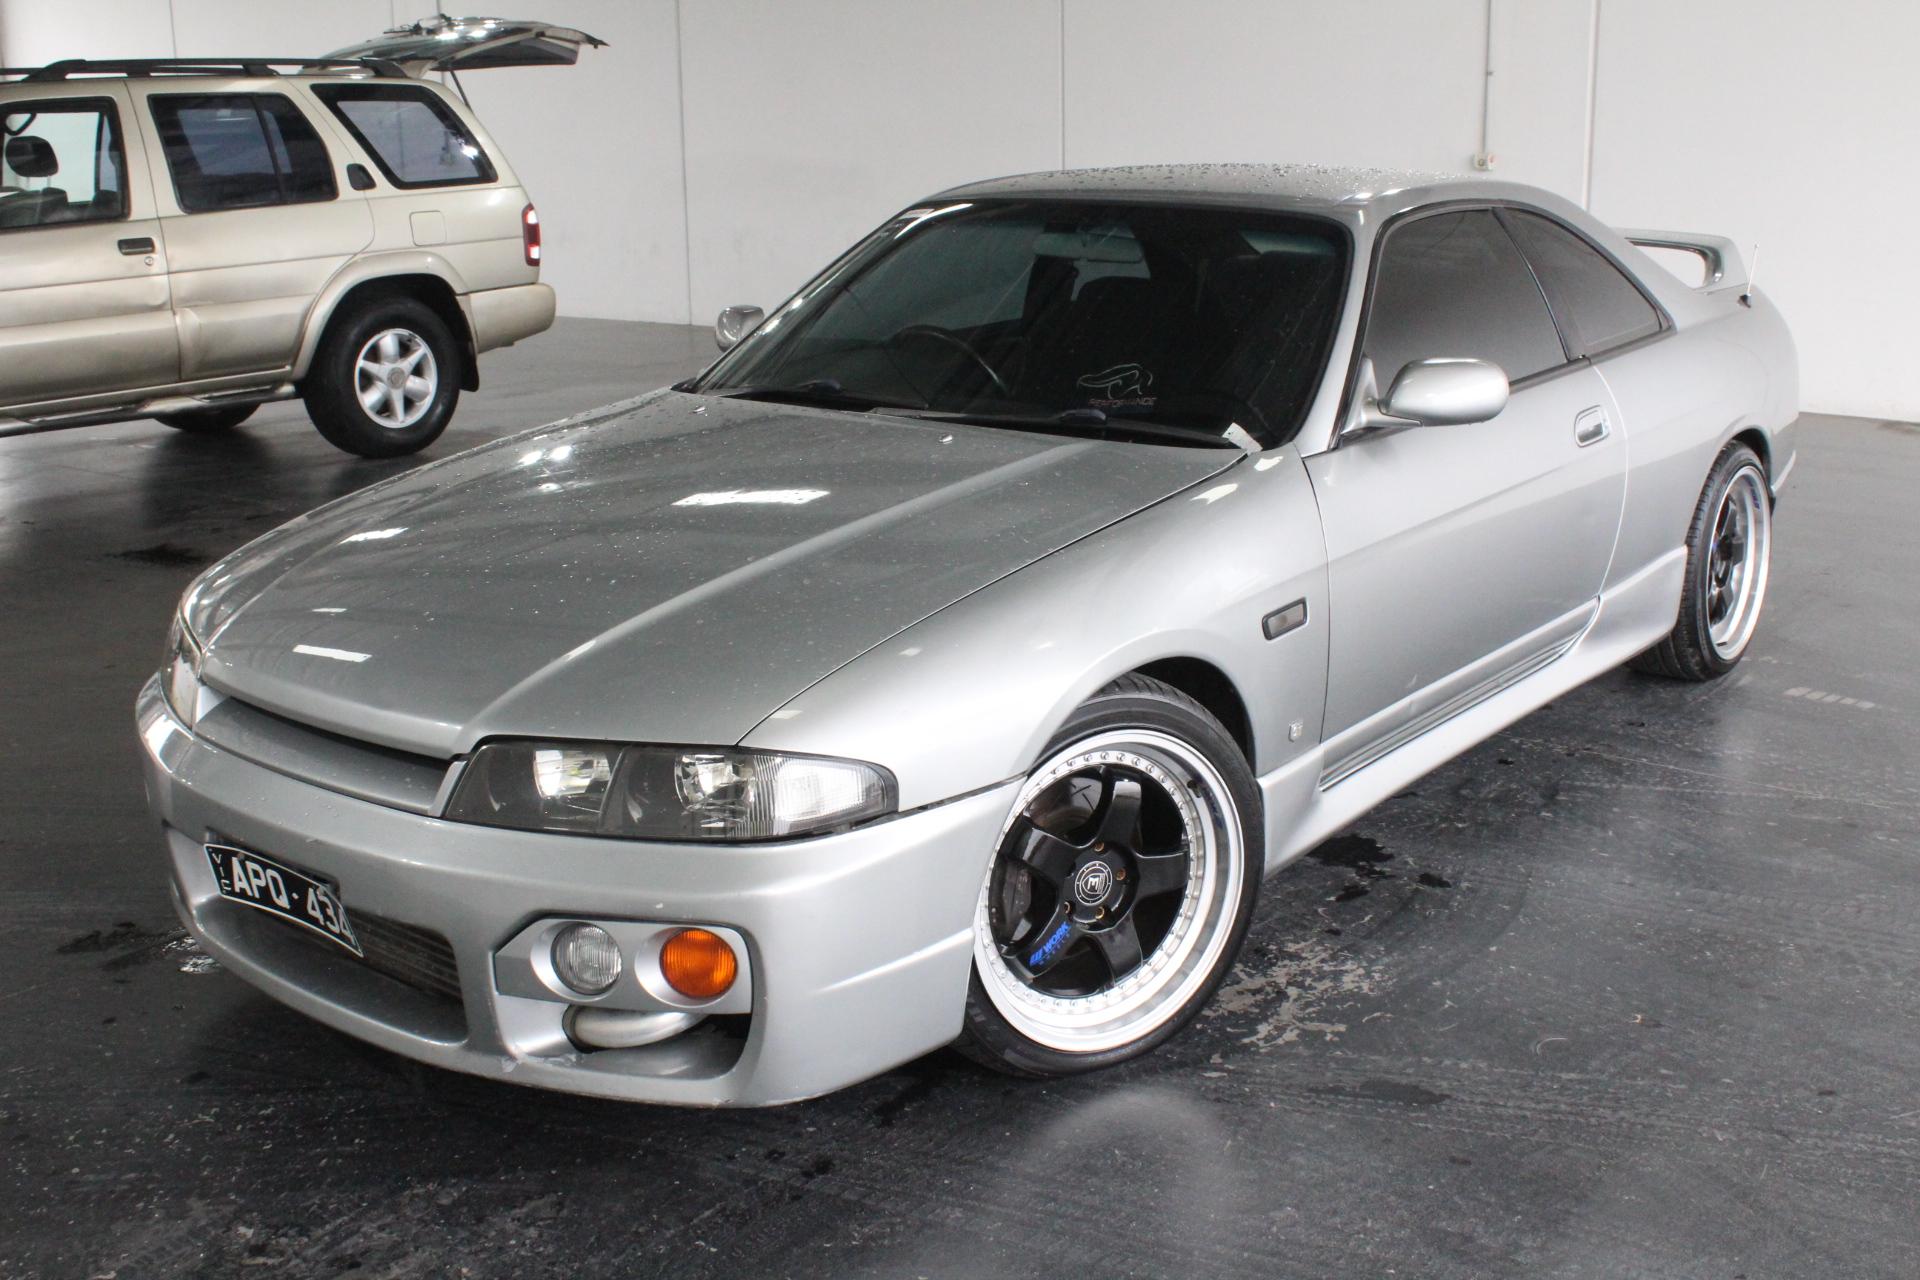 2003 Nissan Skyline R33 Manual Coupe